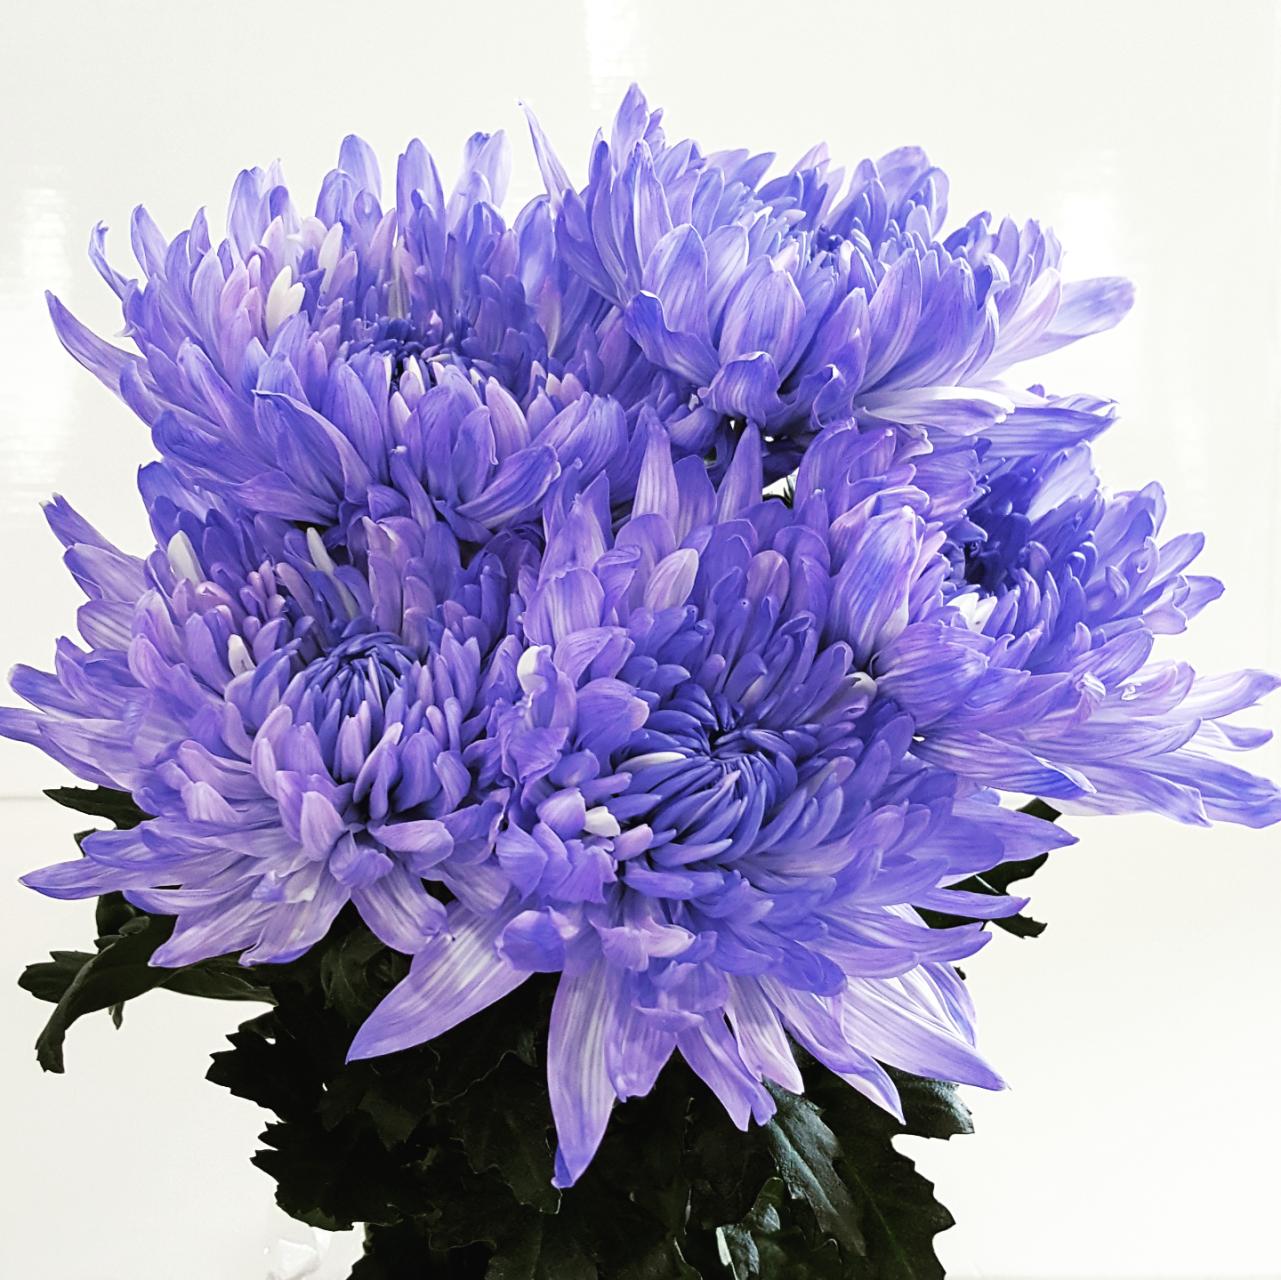 Dyed disbud purple